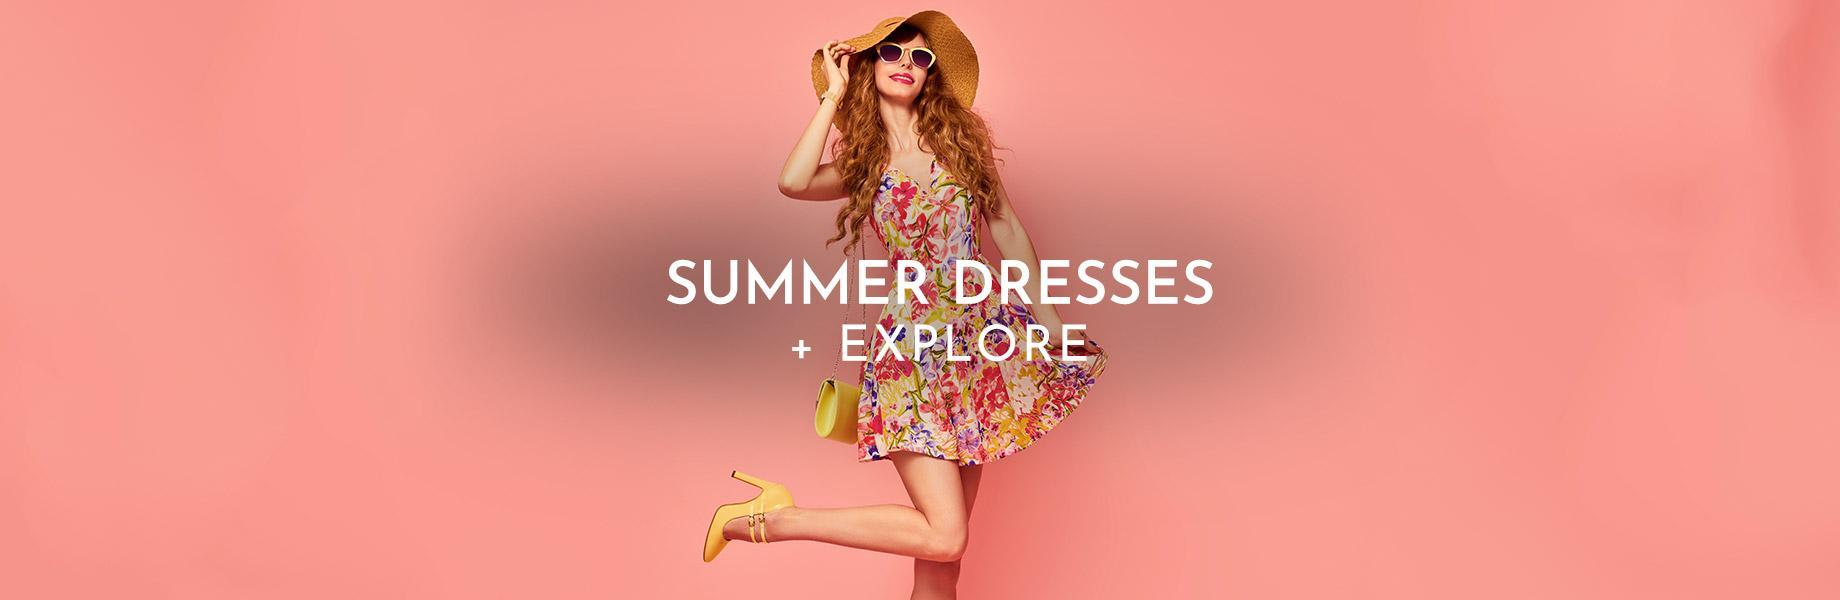 Summer-dresses-